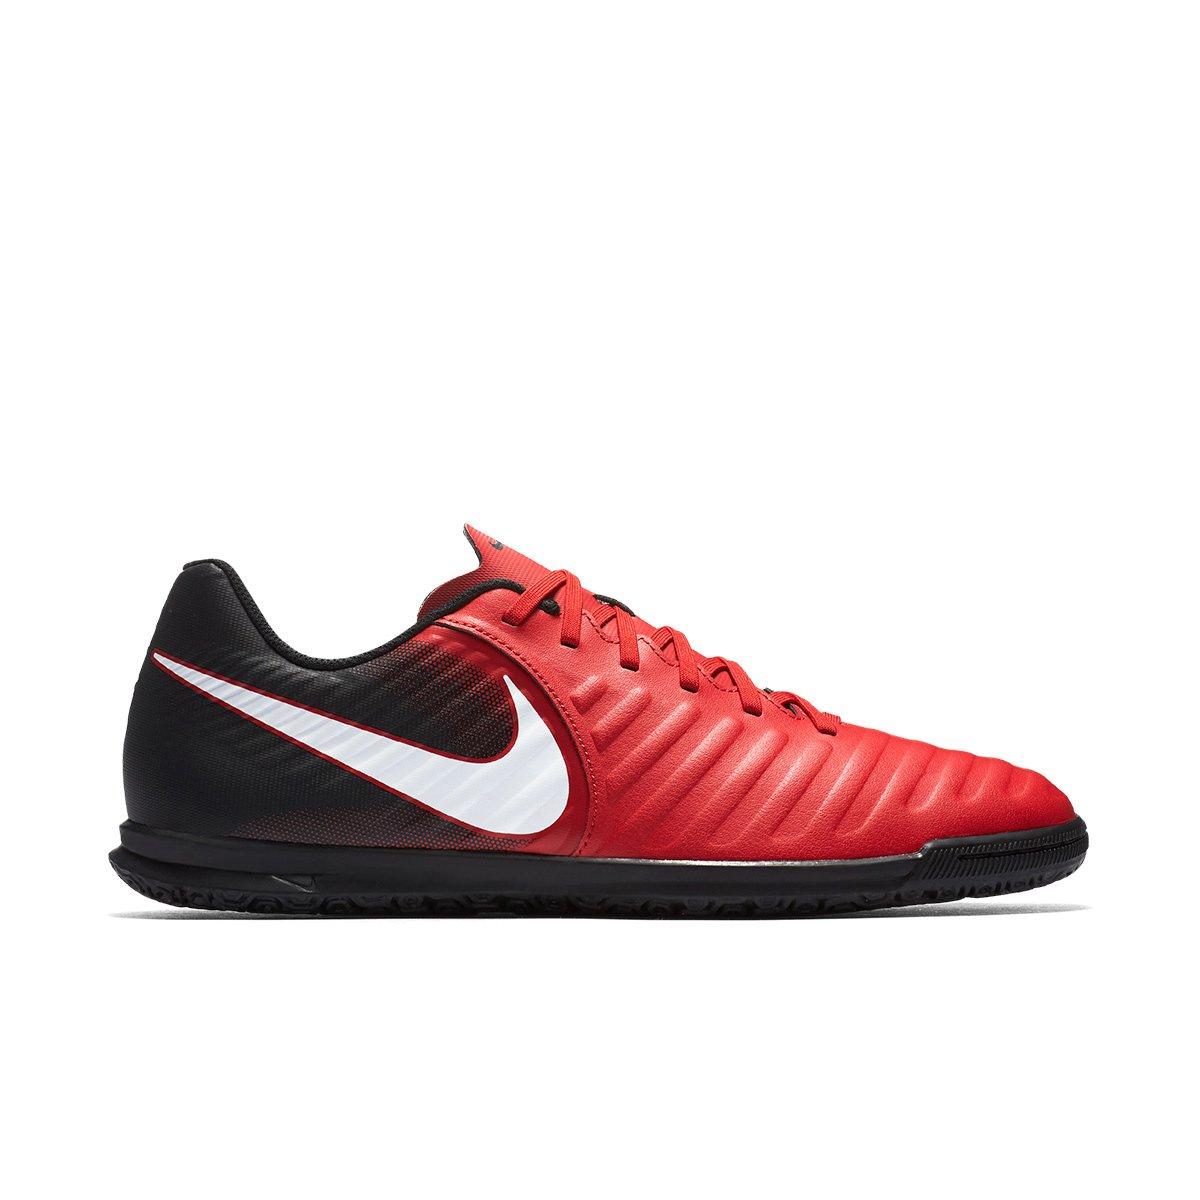 dfc617470b Chuteira Futsal Nike Tiempo Rio 4 IC - Compre Agora